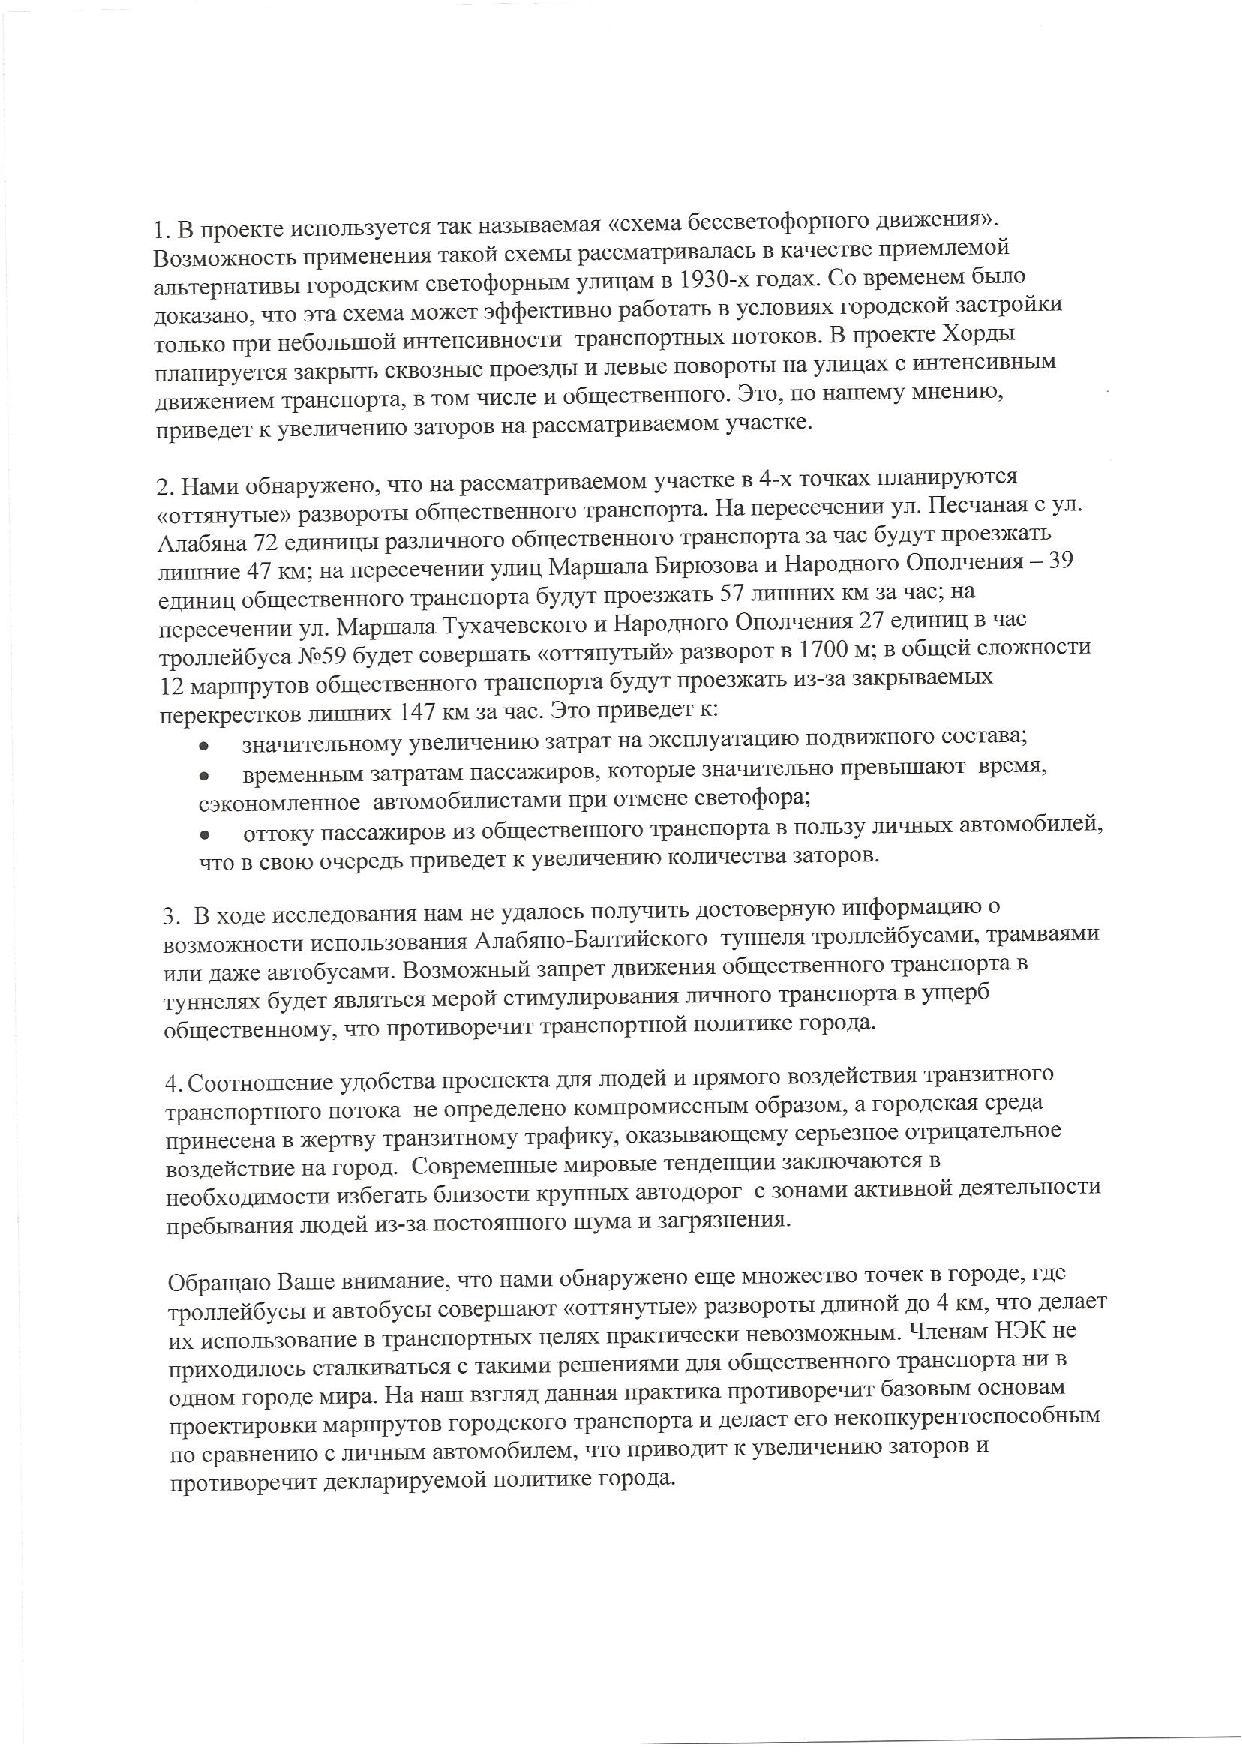 Вучик про хорду-page-002